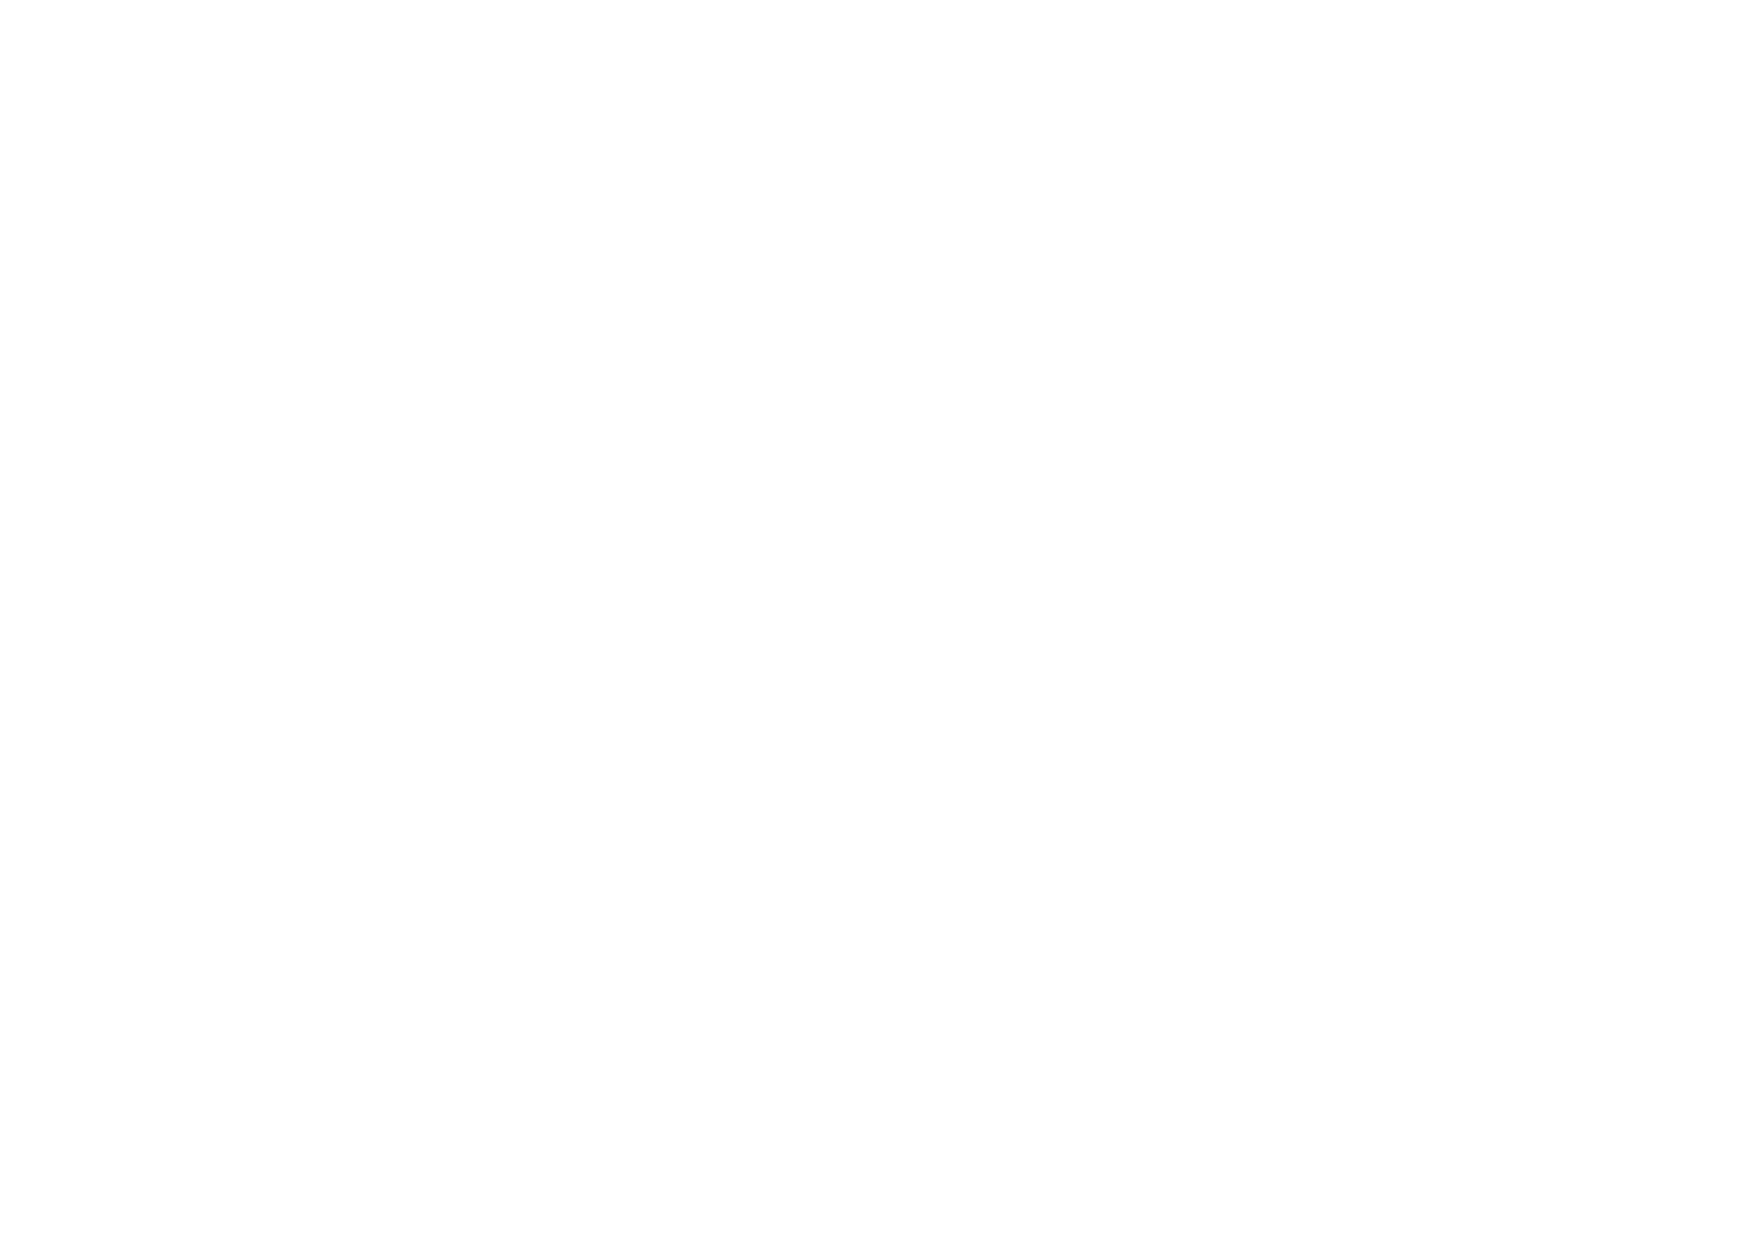 GDPR comliance solution logo